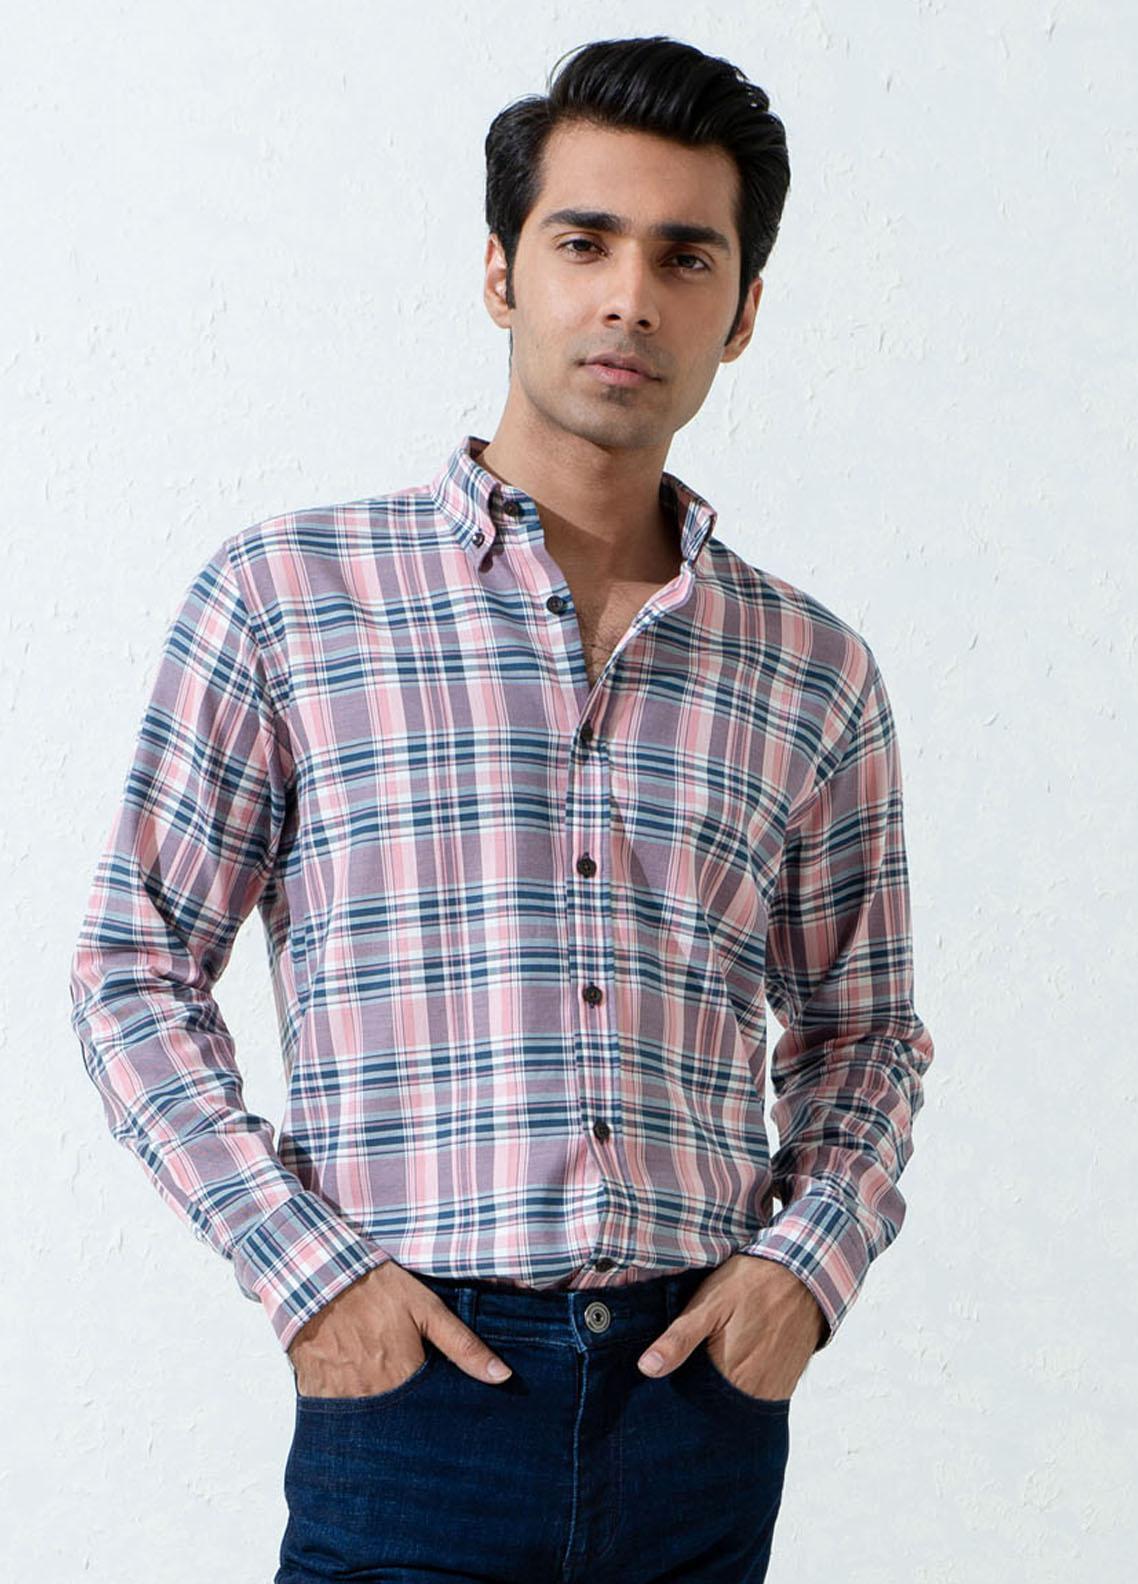 Brumano Cotton Full Sleeves Casual Men Shirts -  BM21SH Pink & Navy Checkered Flannel